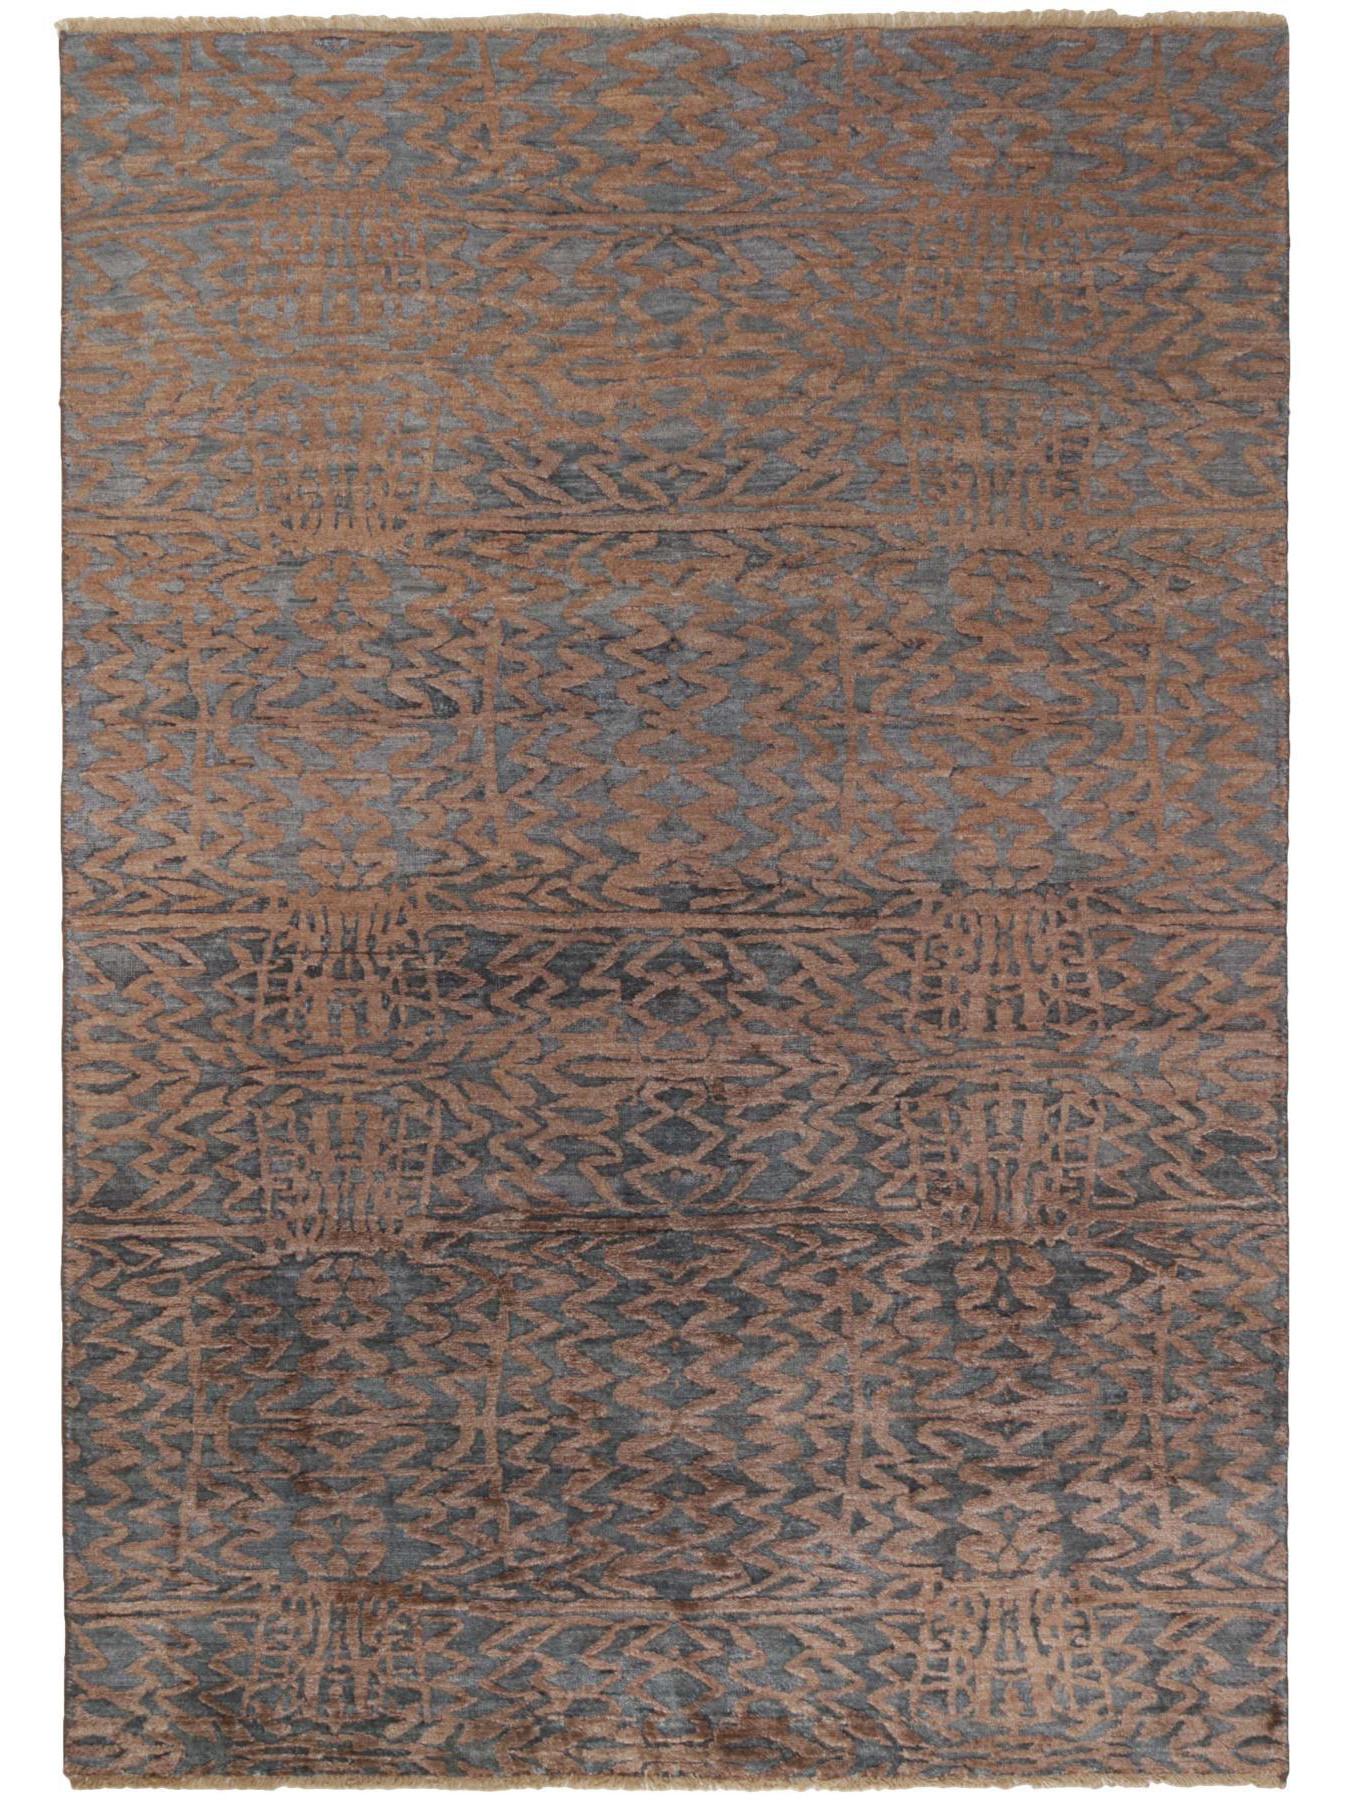 Luxury carpets - Damask-AL-417 HB-6/HB-19